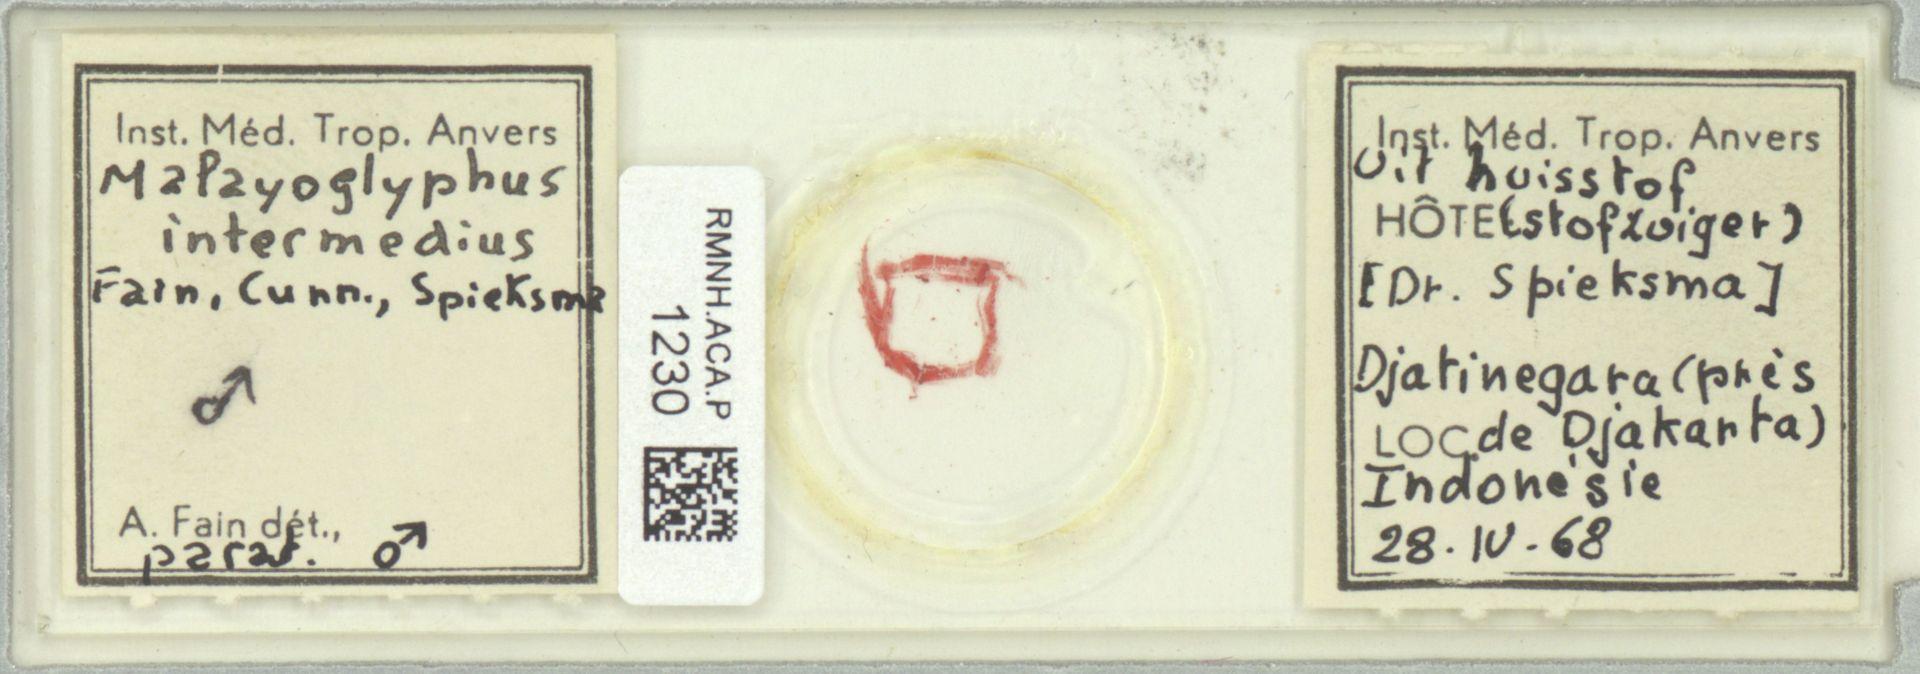 RMNH.ACA.P.1230 | Malayoglyphus intermedius Fain, Cunn., Spieksma